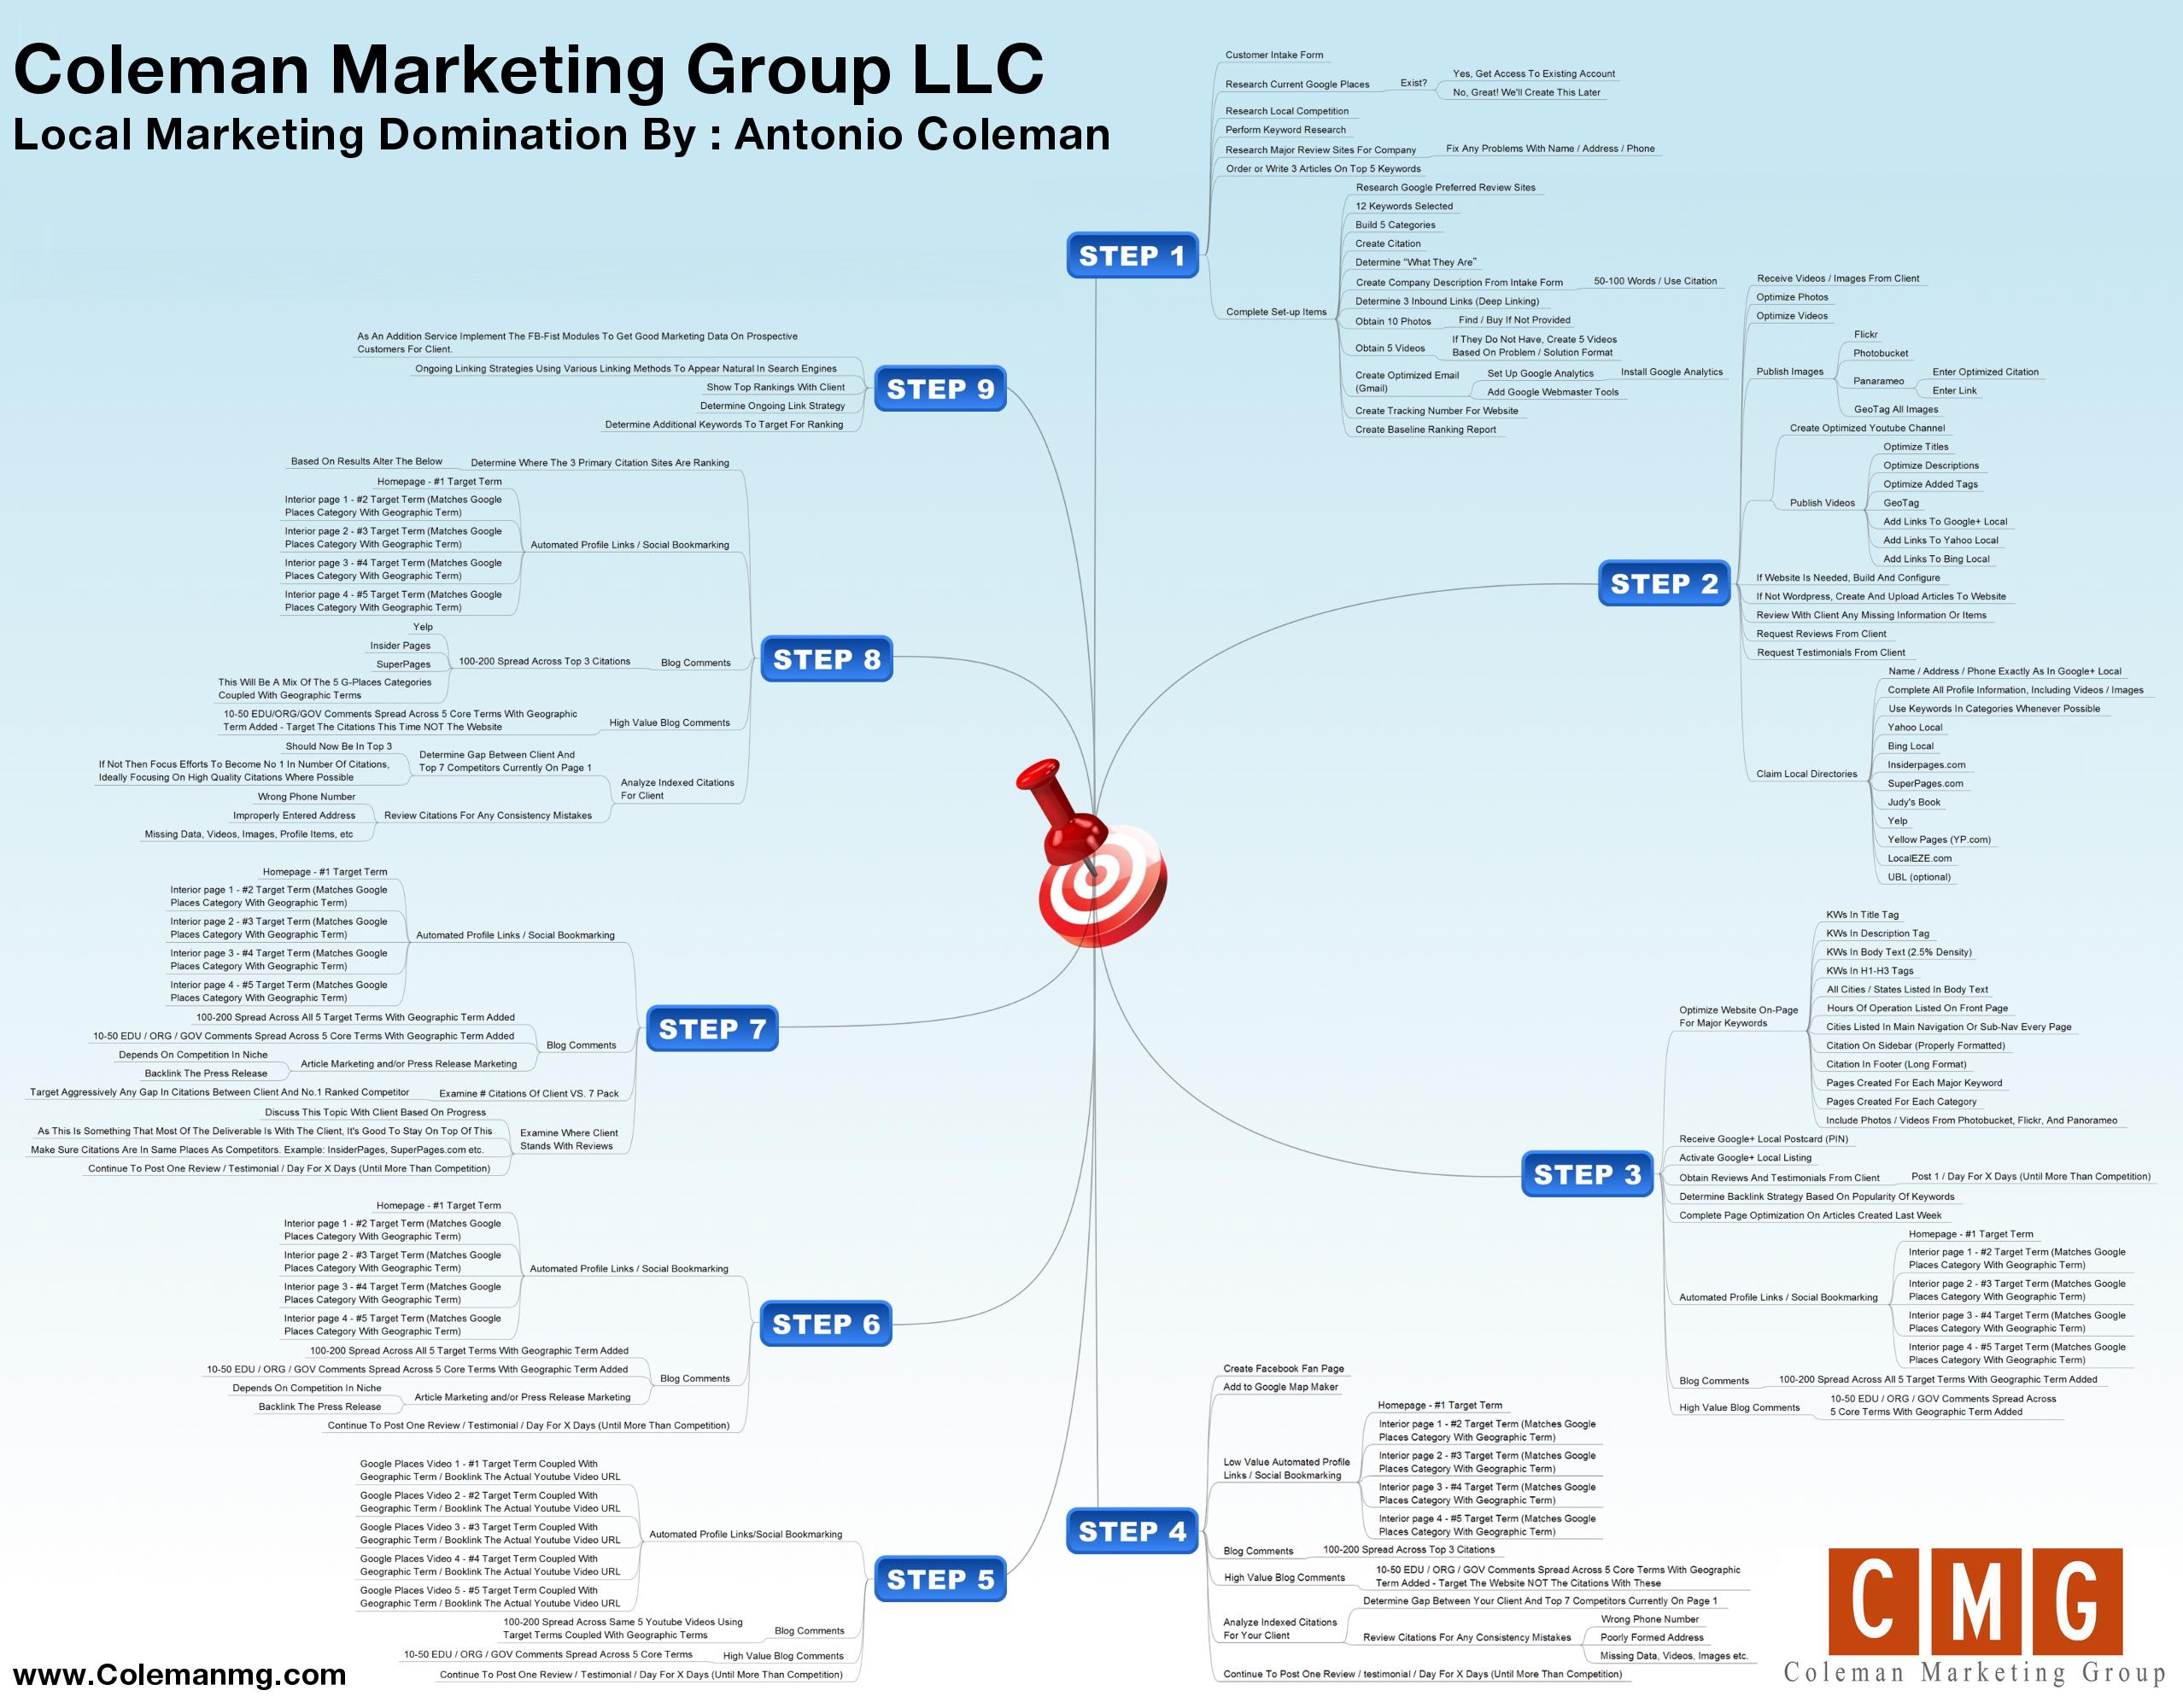 Local SEO Services | Coleman Marketing Group LLC | Local SEO